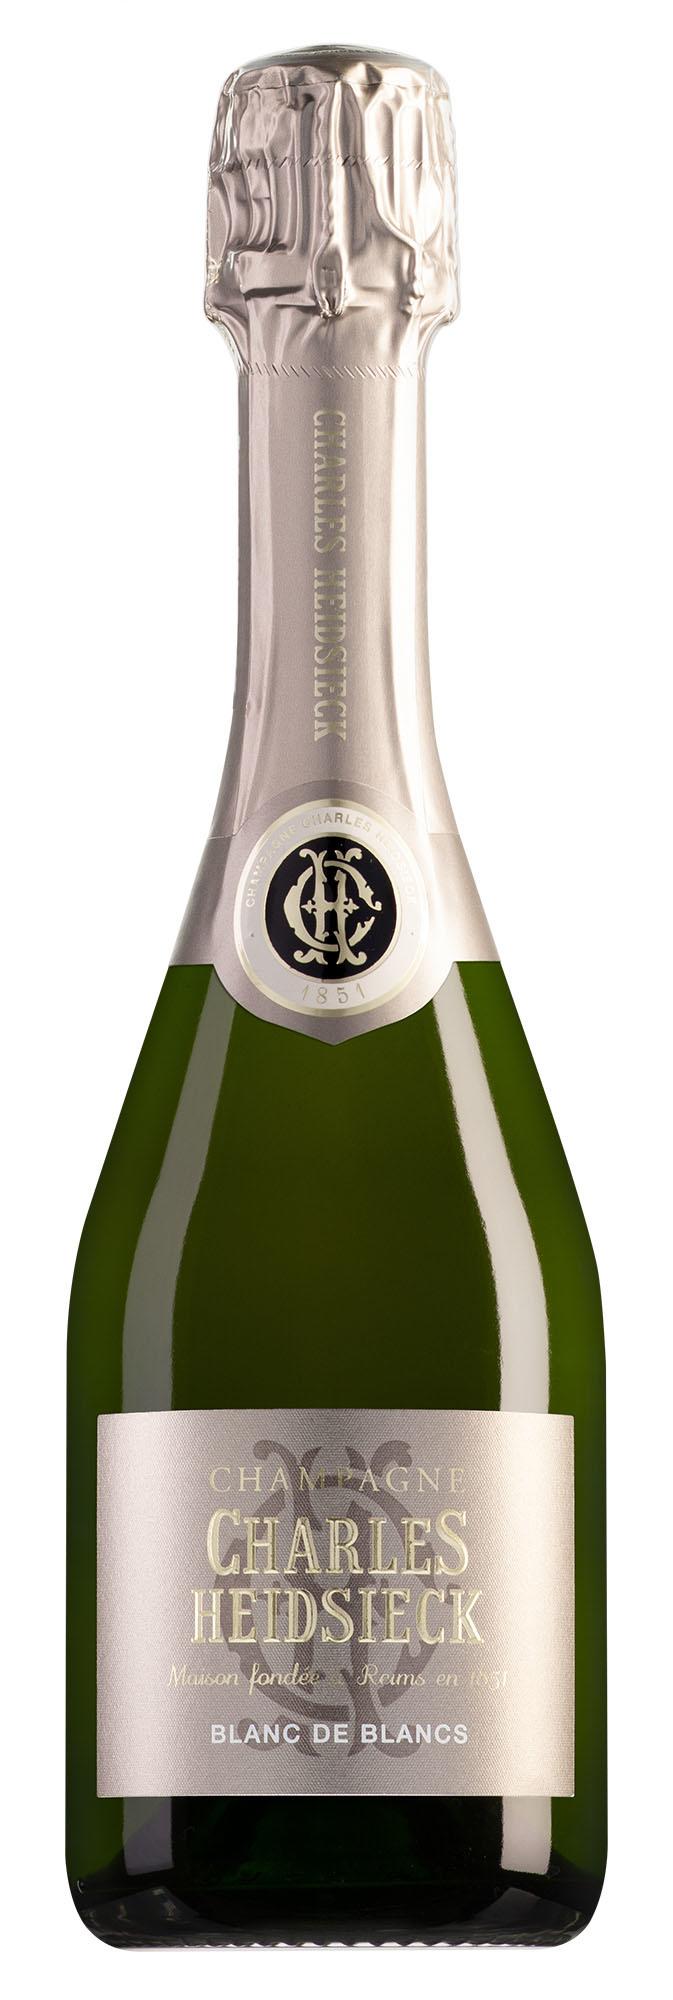 Charles Heidsieck Champagne Blanc de Blancs half bottle